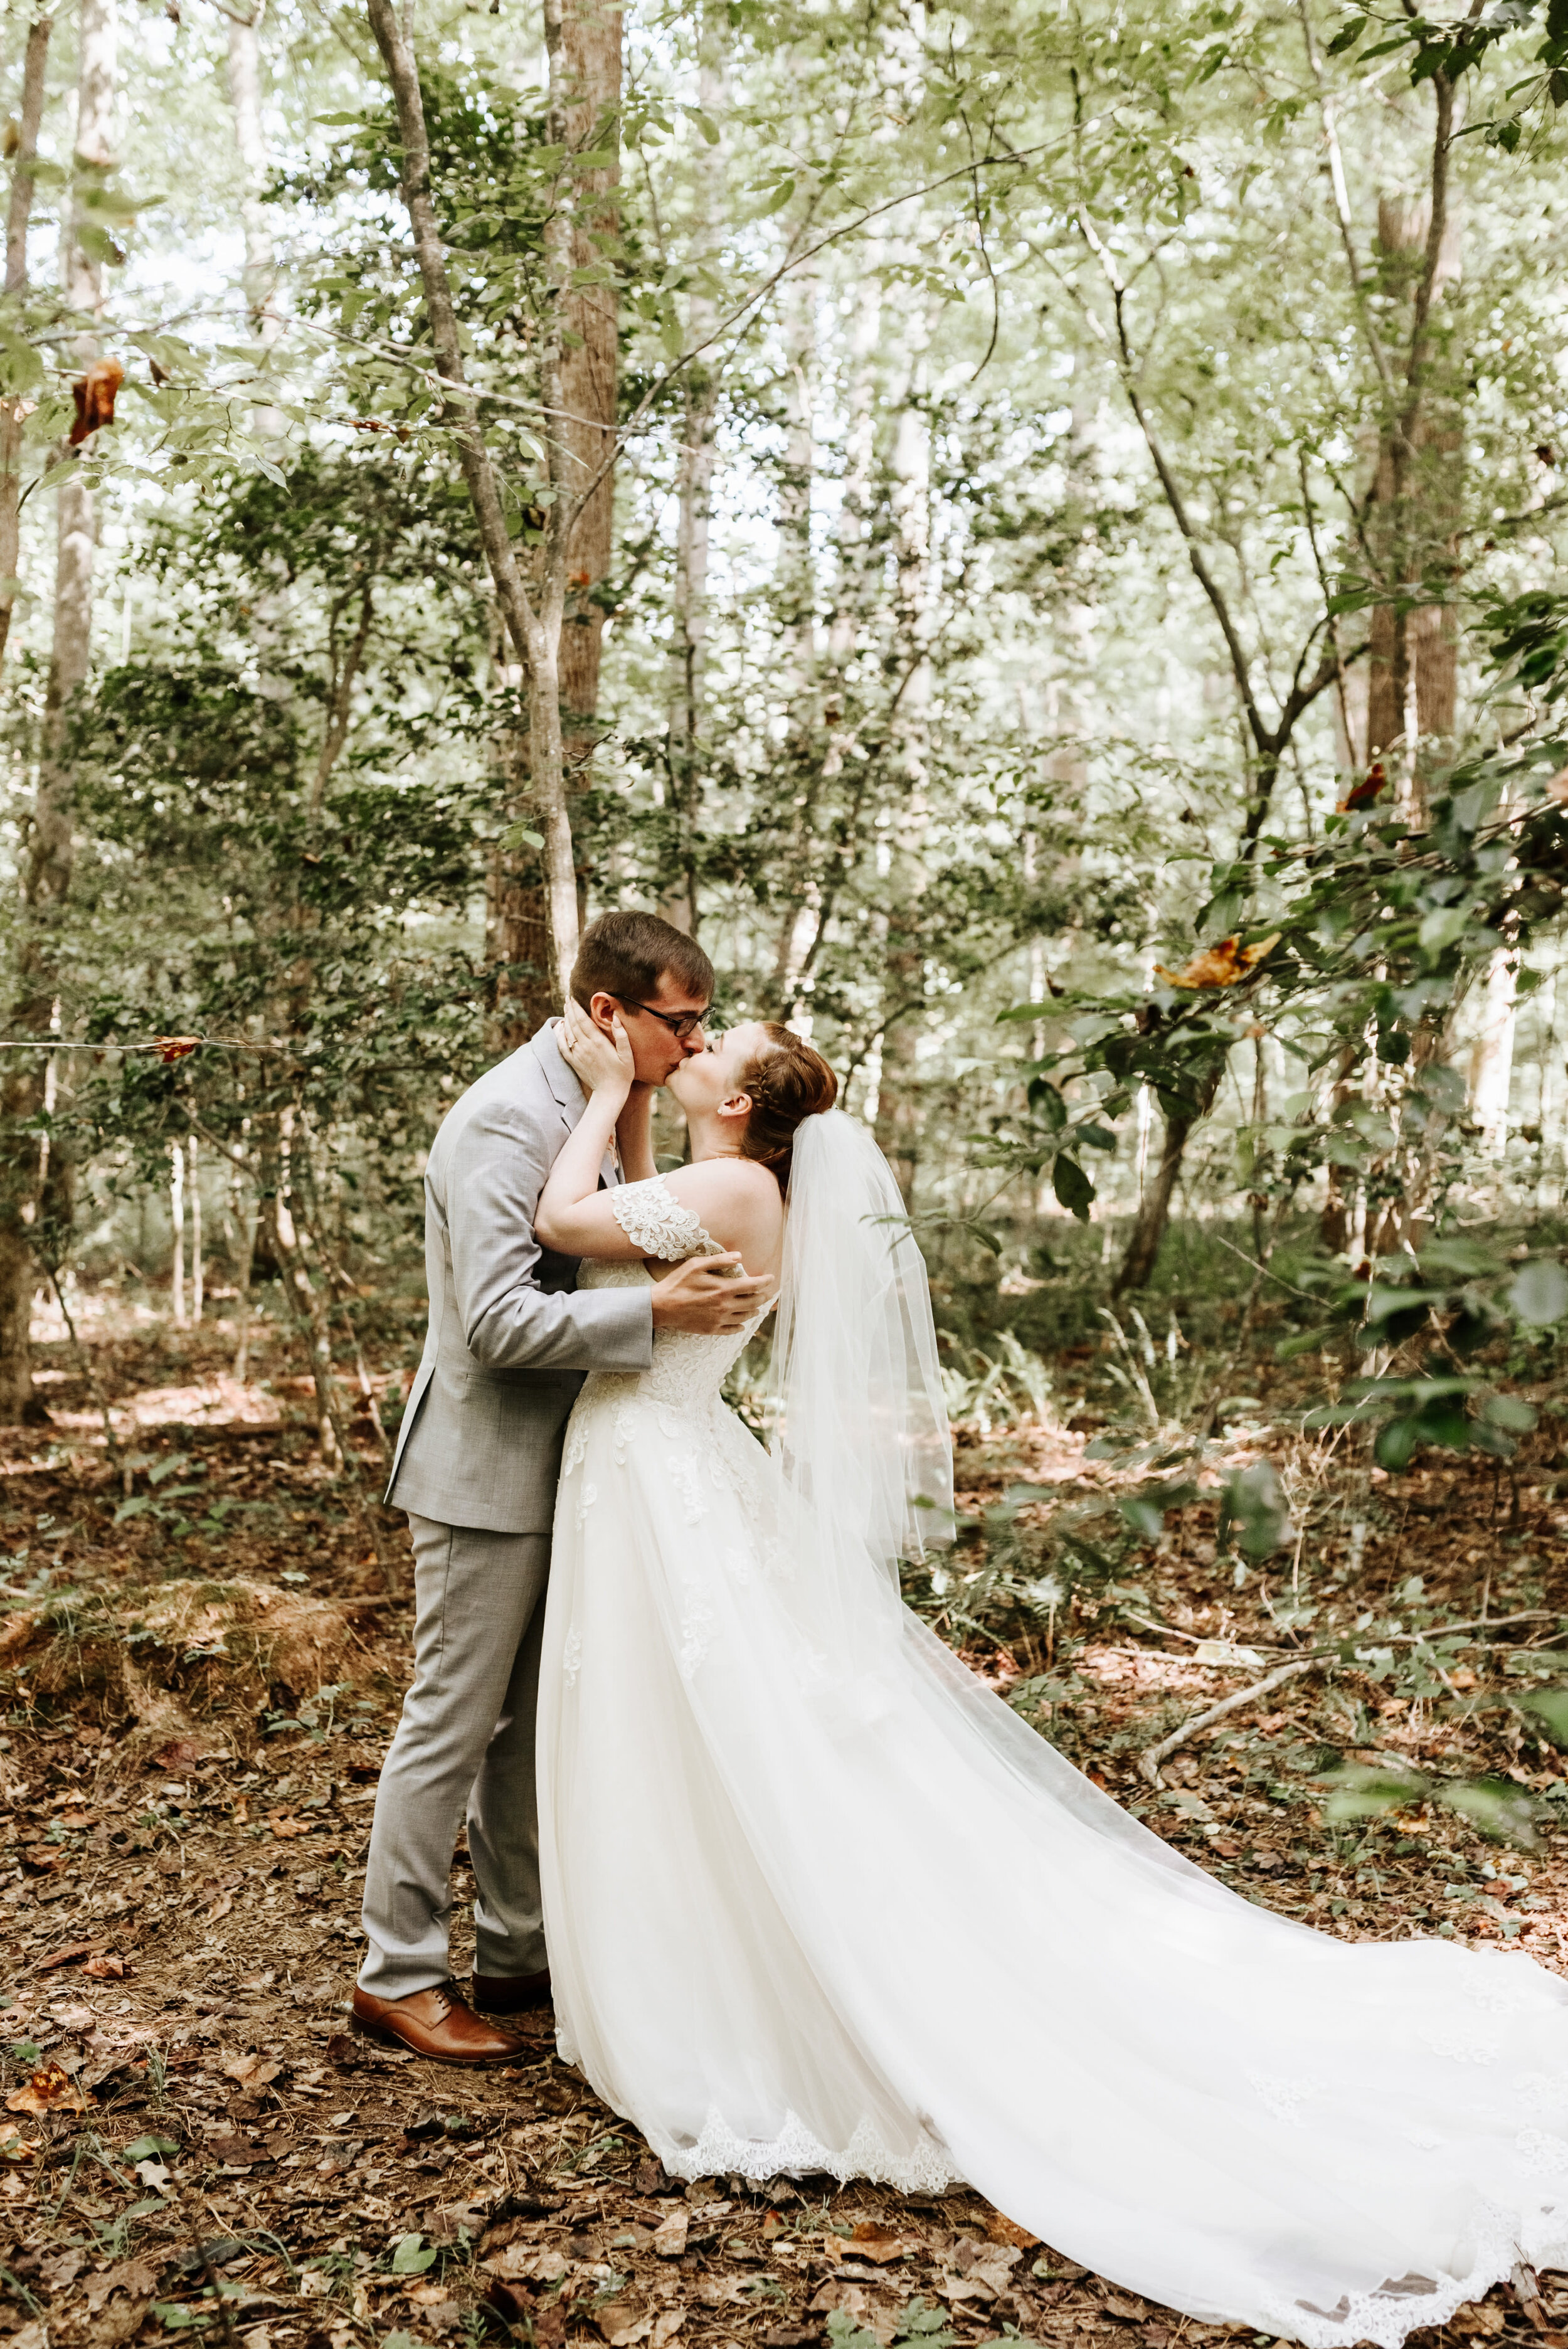 Rachel_David_Wedding_Richmond_Virginia_Photography_by_V_18.jpg